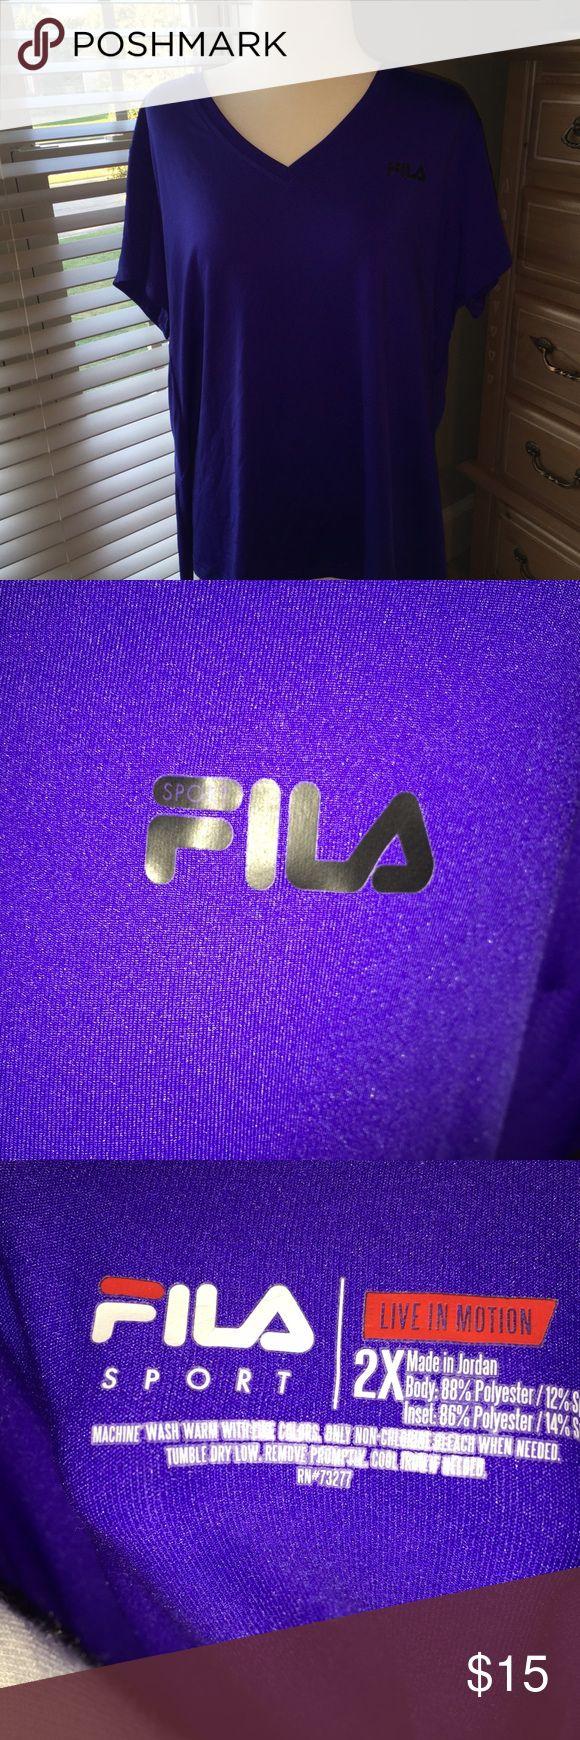 Woman's Fila v neck 2X plus Dri workout t-shirt Ladies Plus size 2X Vneck Fila moisture wicking workout t shirt Fila Tops Tees - Short Sleeve